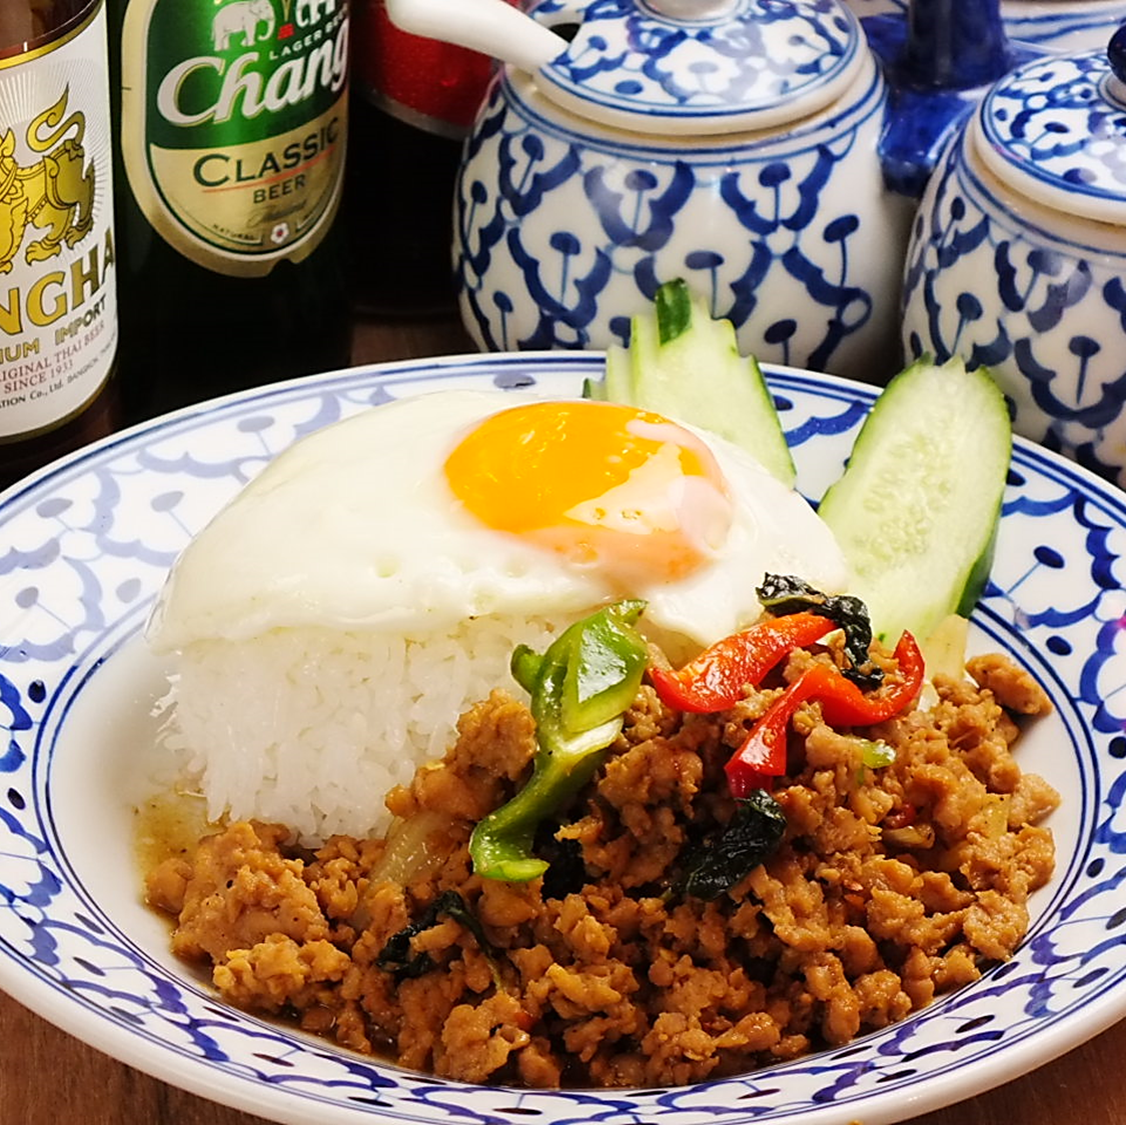 Gapa Rice / Cao Man Gai